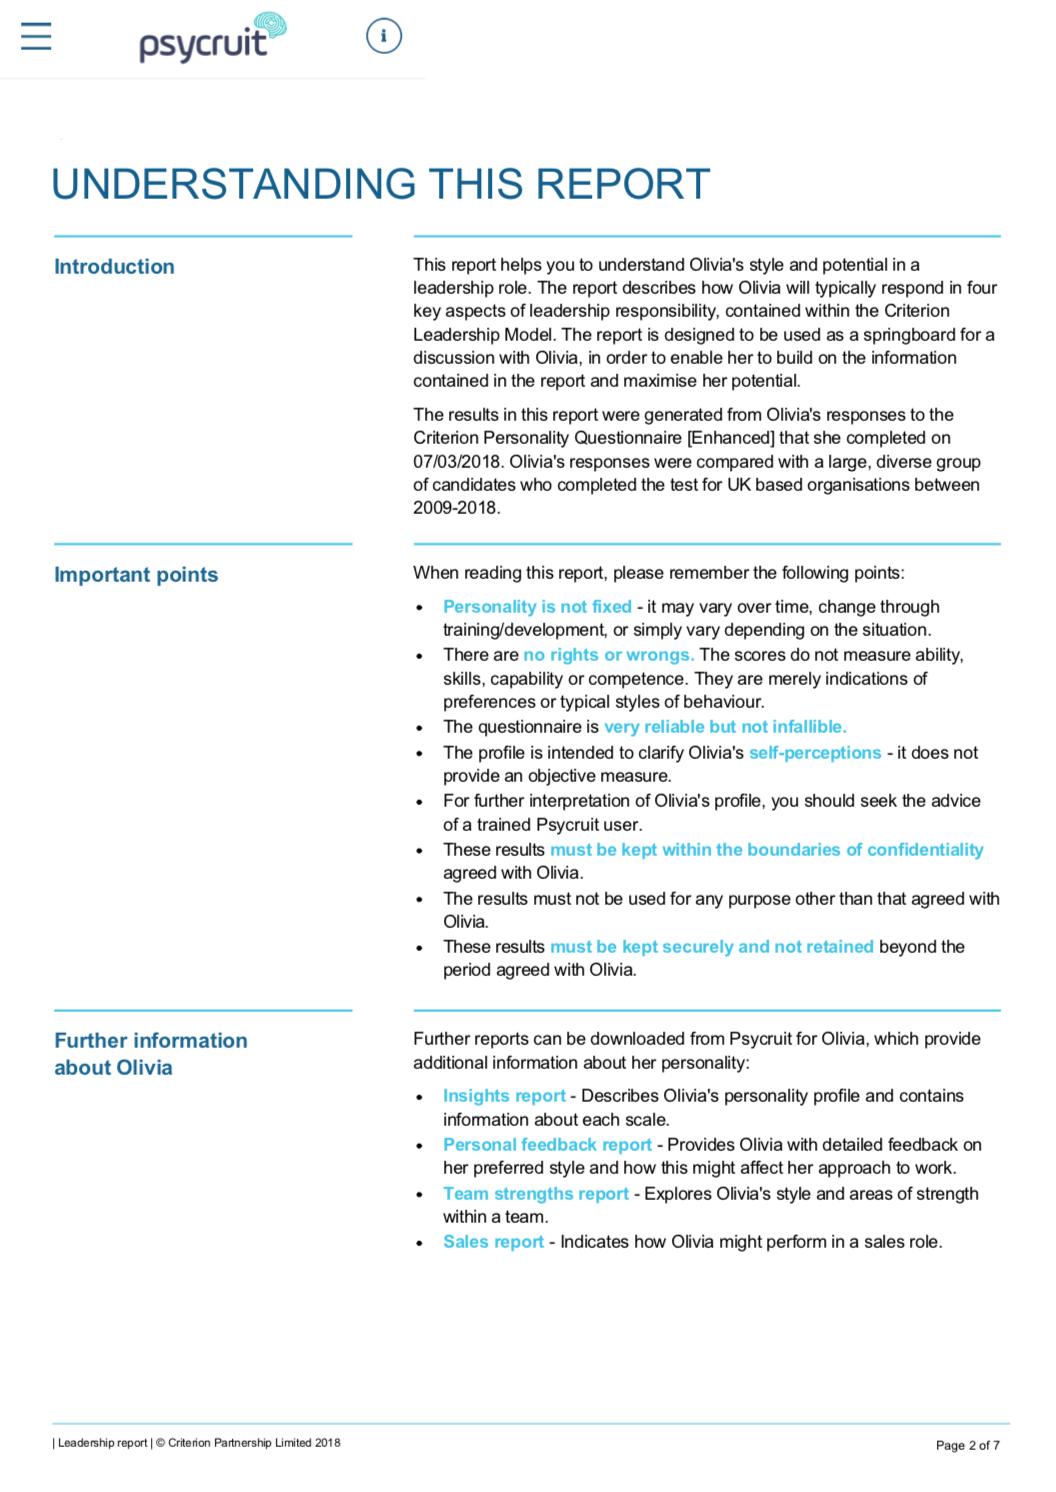 Leadership Model Overview